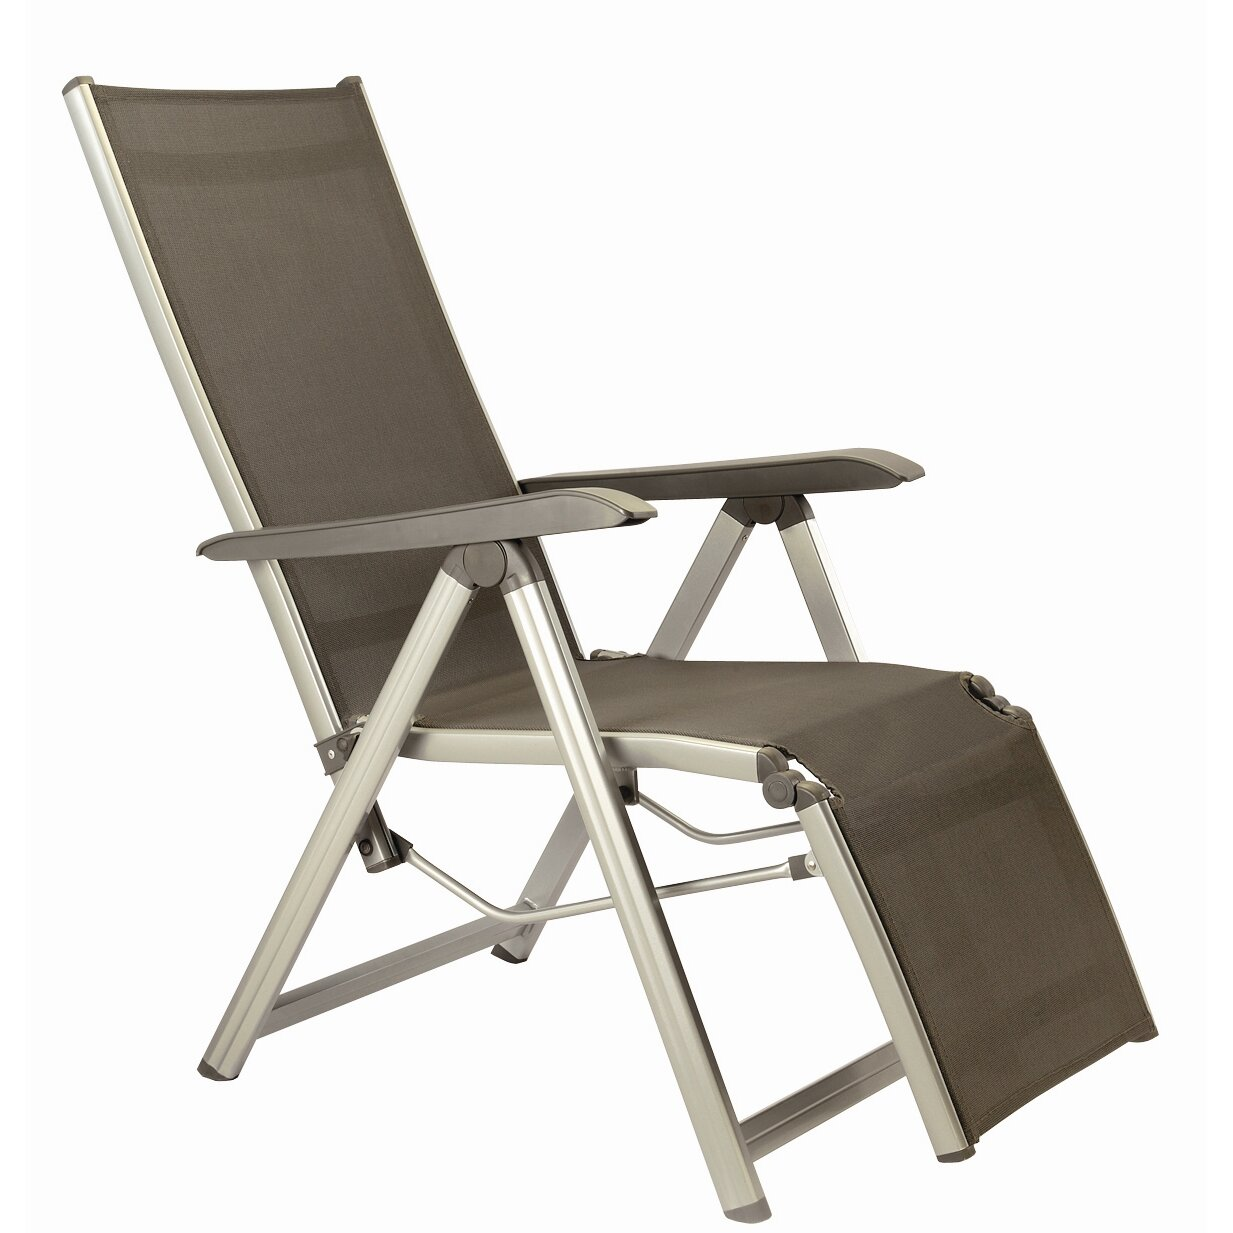 Basic Plus Relaxer Chaise Lounge Wayfair ~ 08193340_Liegestuhl Kettler Basic Plus